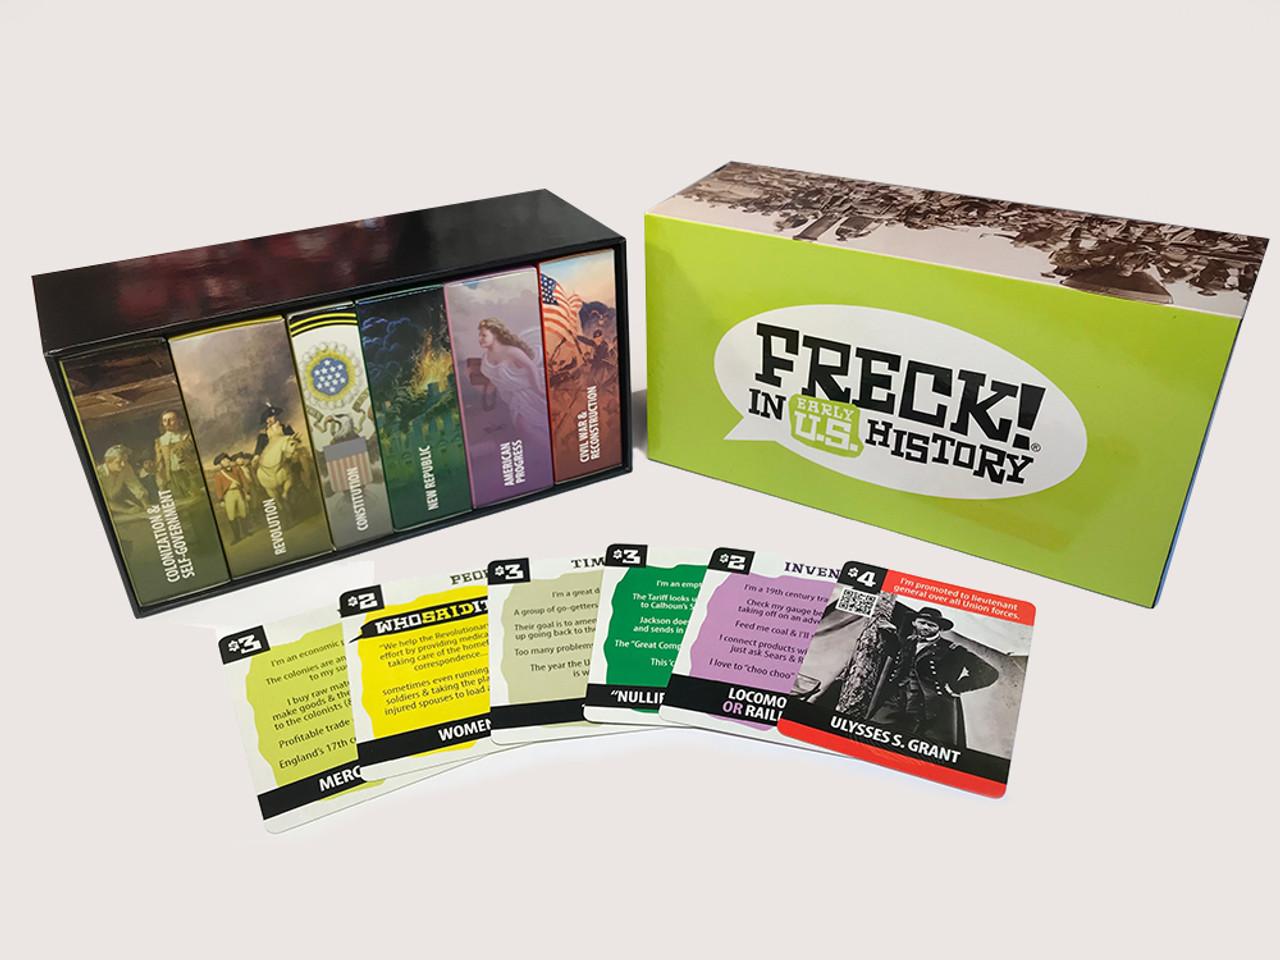 FRECK! Early U.S. (Exploration - Reconstruction) Set